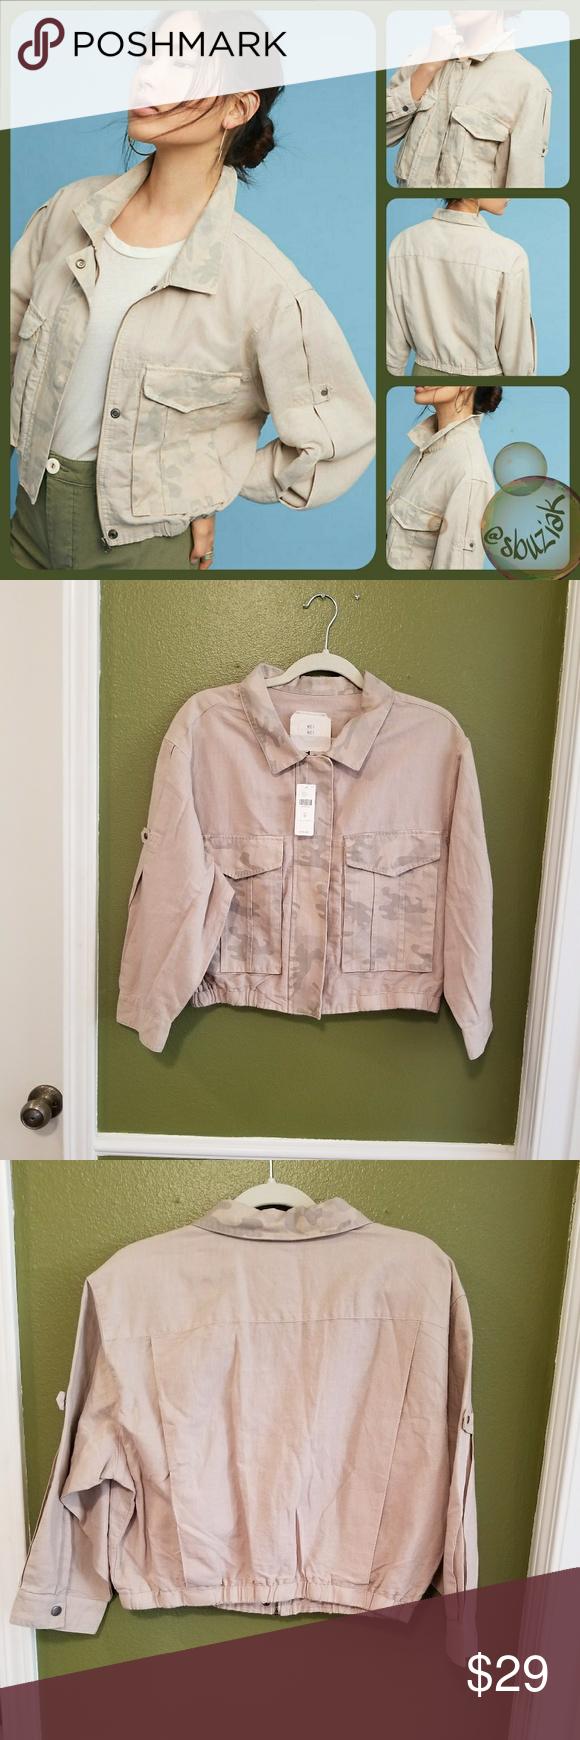 Anthropologie cropped camo jacket nwt pinterest